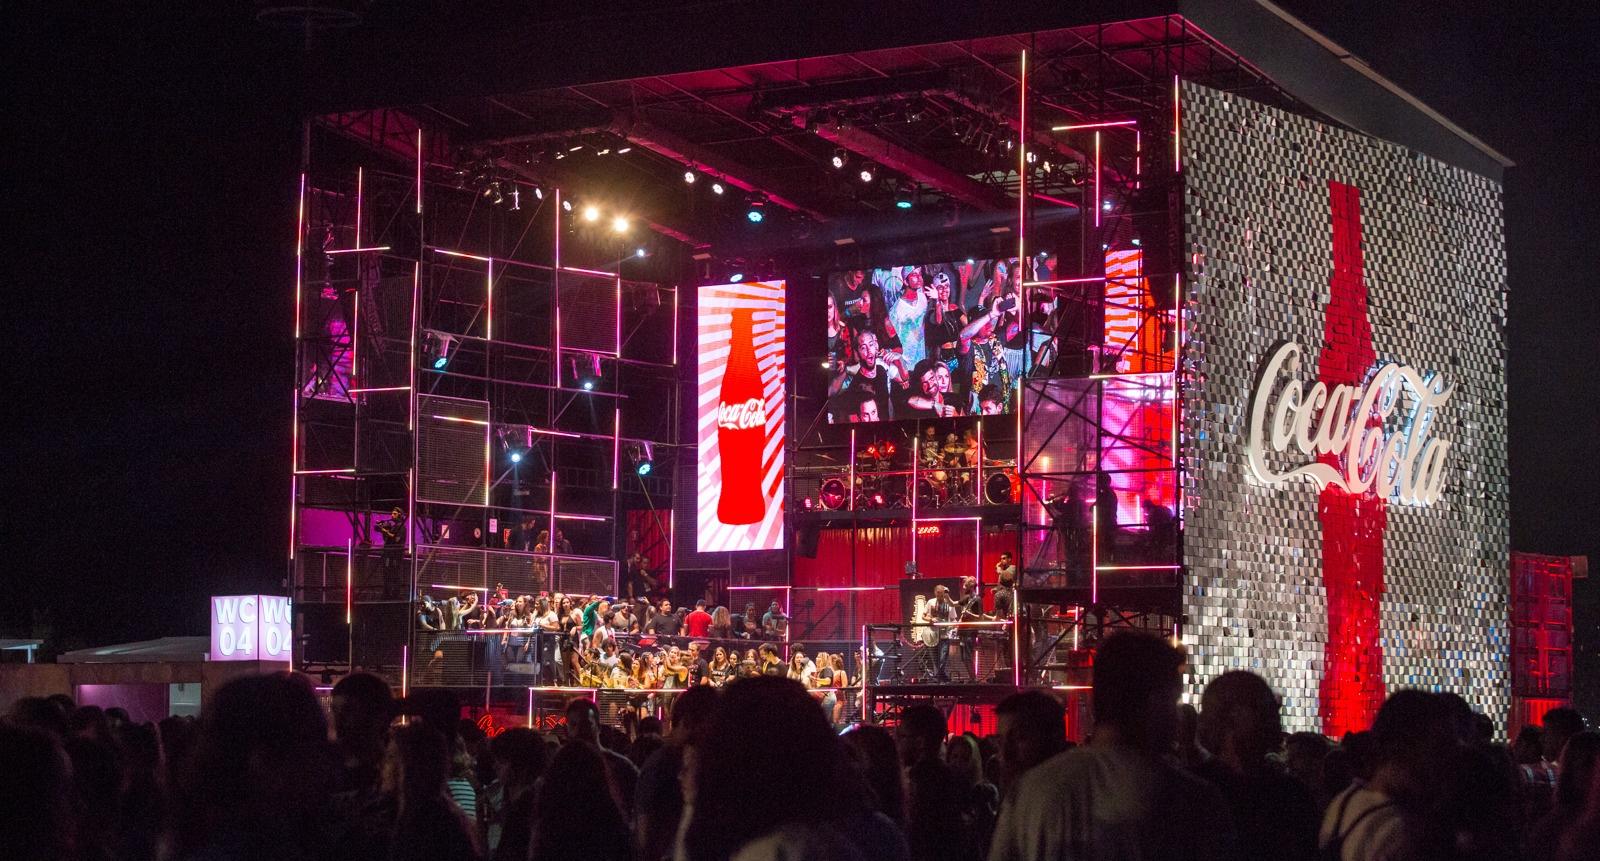 Ativação de marca Rock in Rio - Coca-Cola